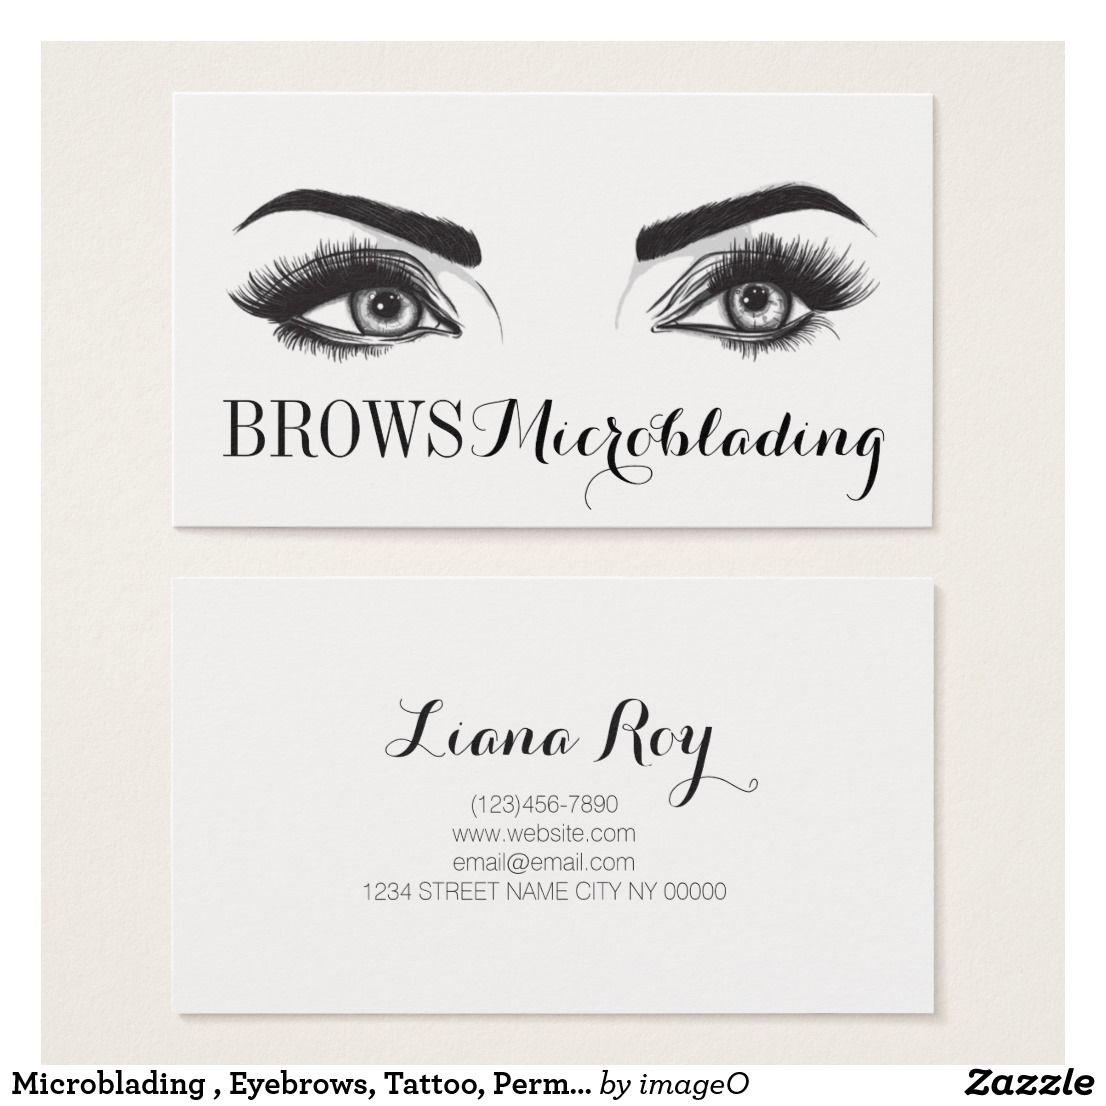 Microblading Eyebrows Tattoo Permanent Makeup Business Card Zazzle Com Makeup Business Cards Microblading Business Cards